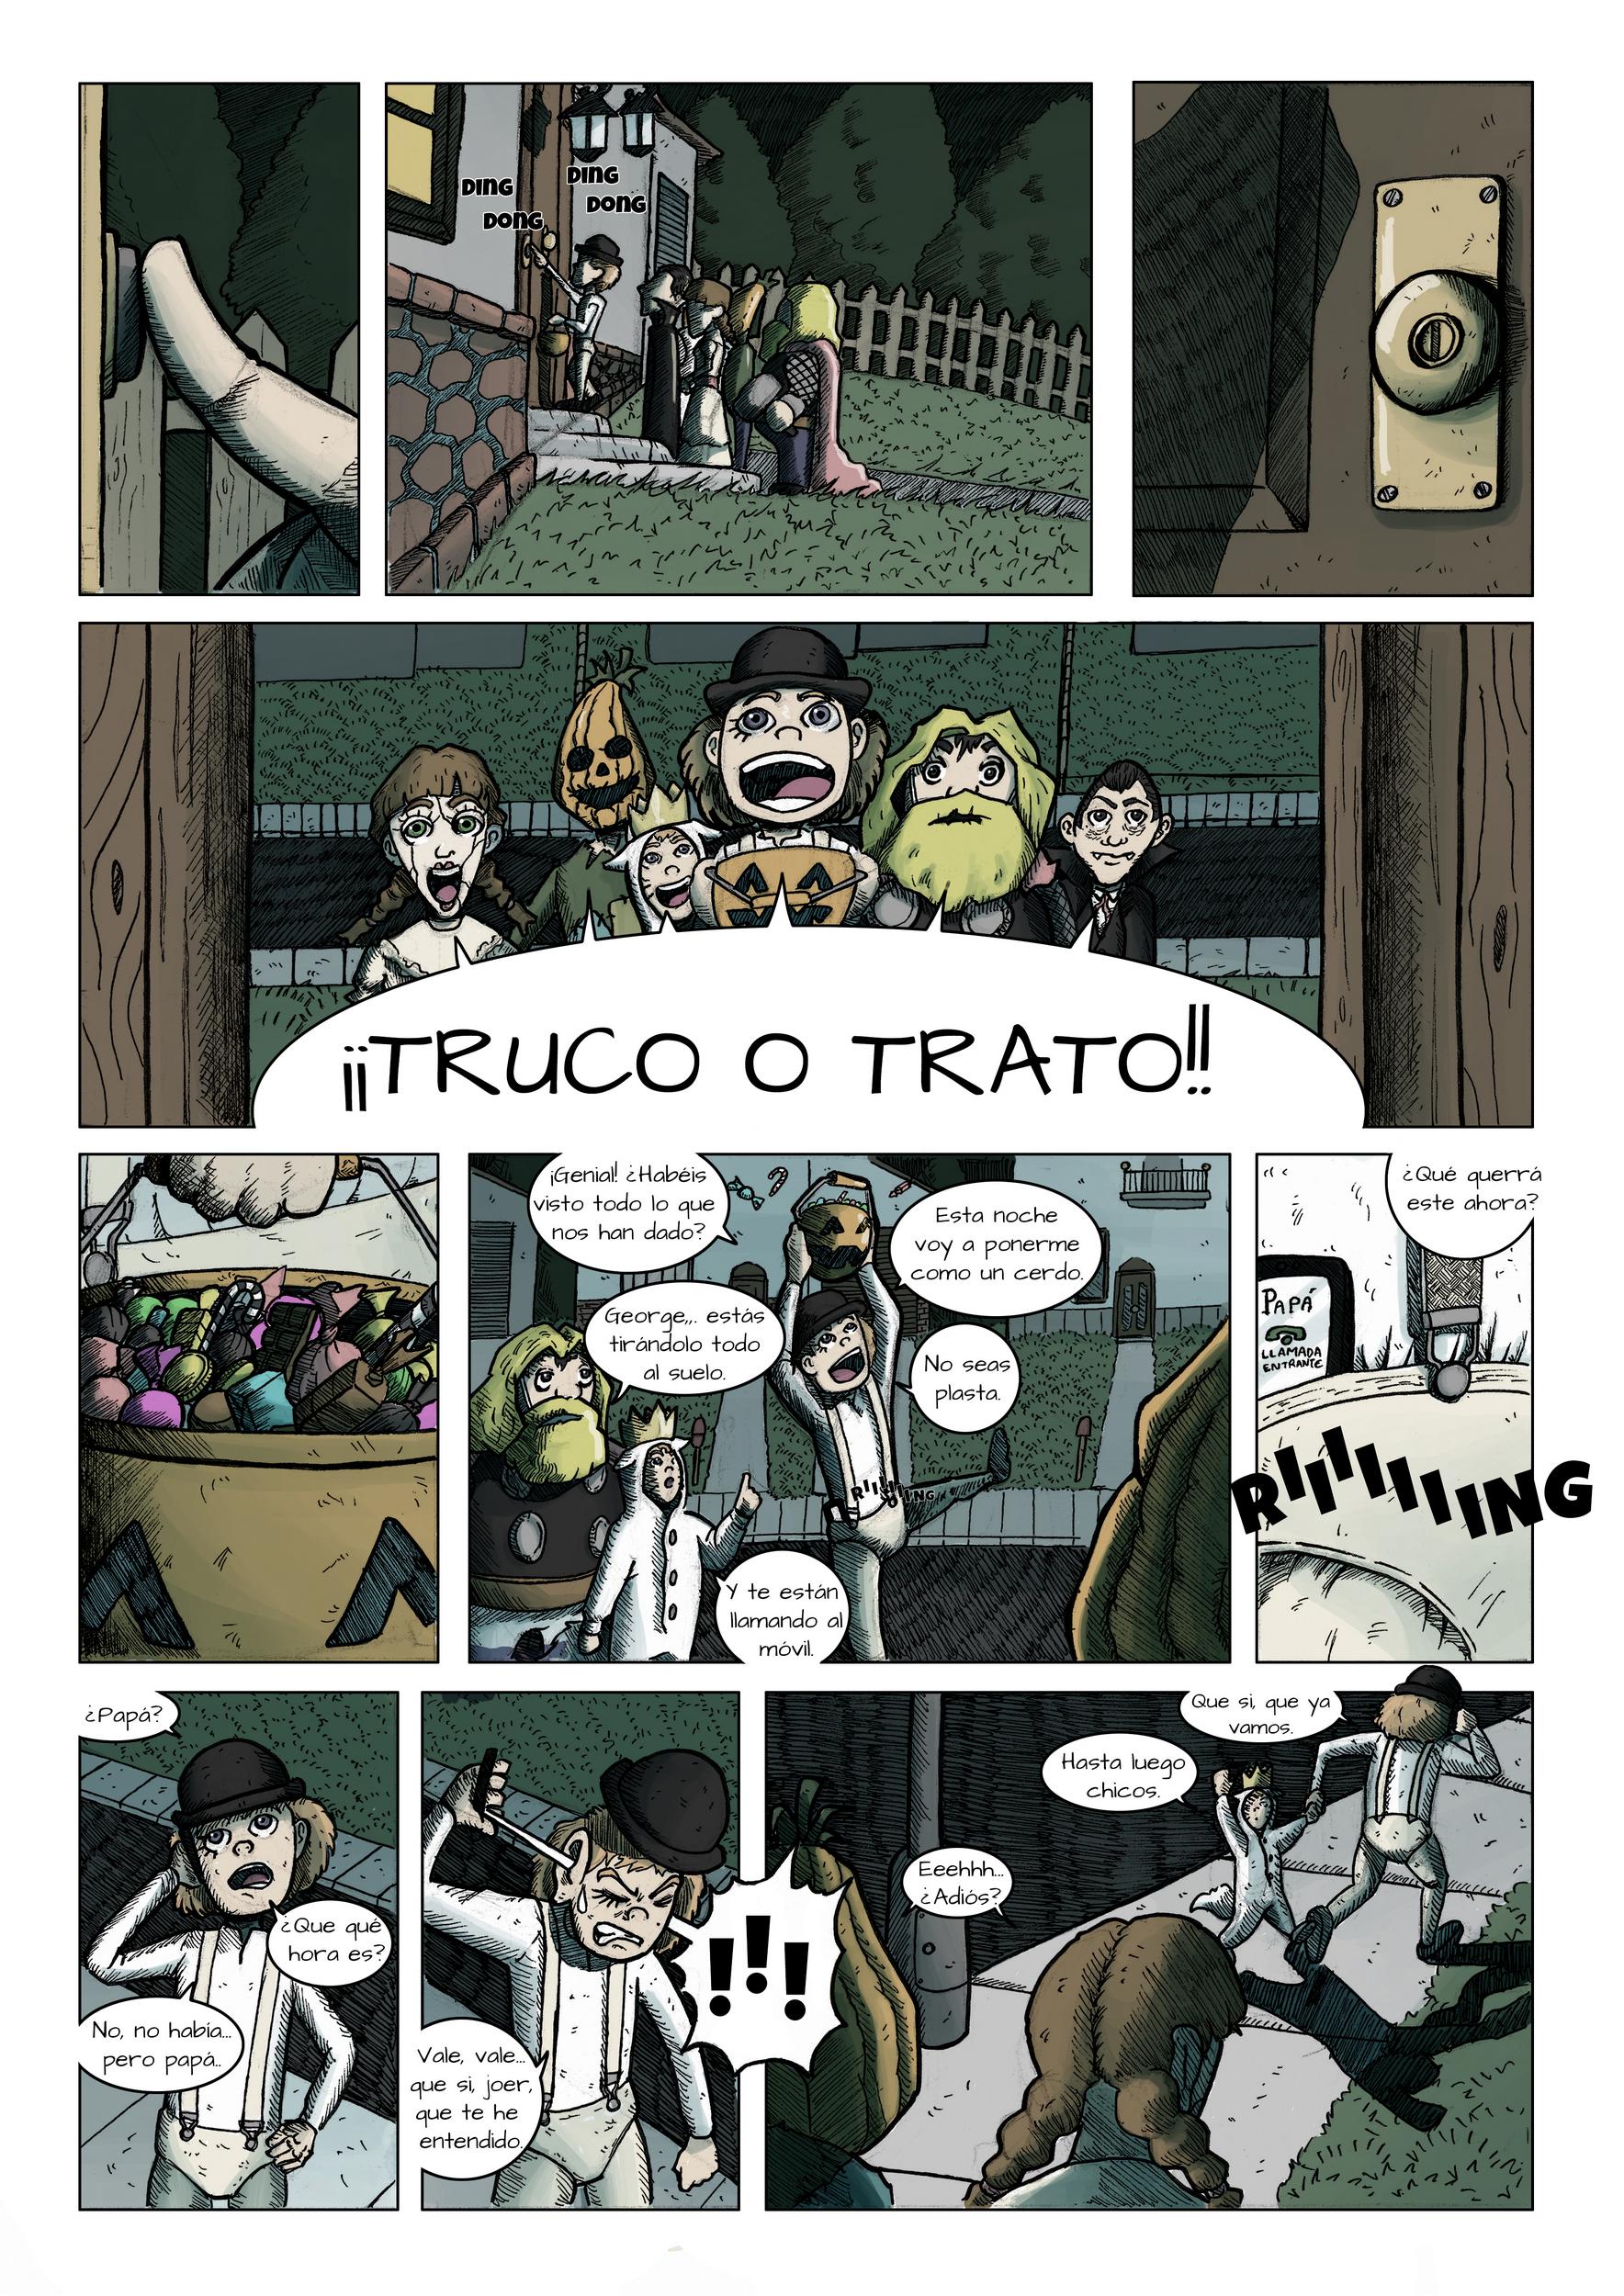 02_Alberto Sánchez López__Espiritu de Halloween - Página 1_2500_0004